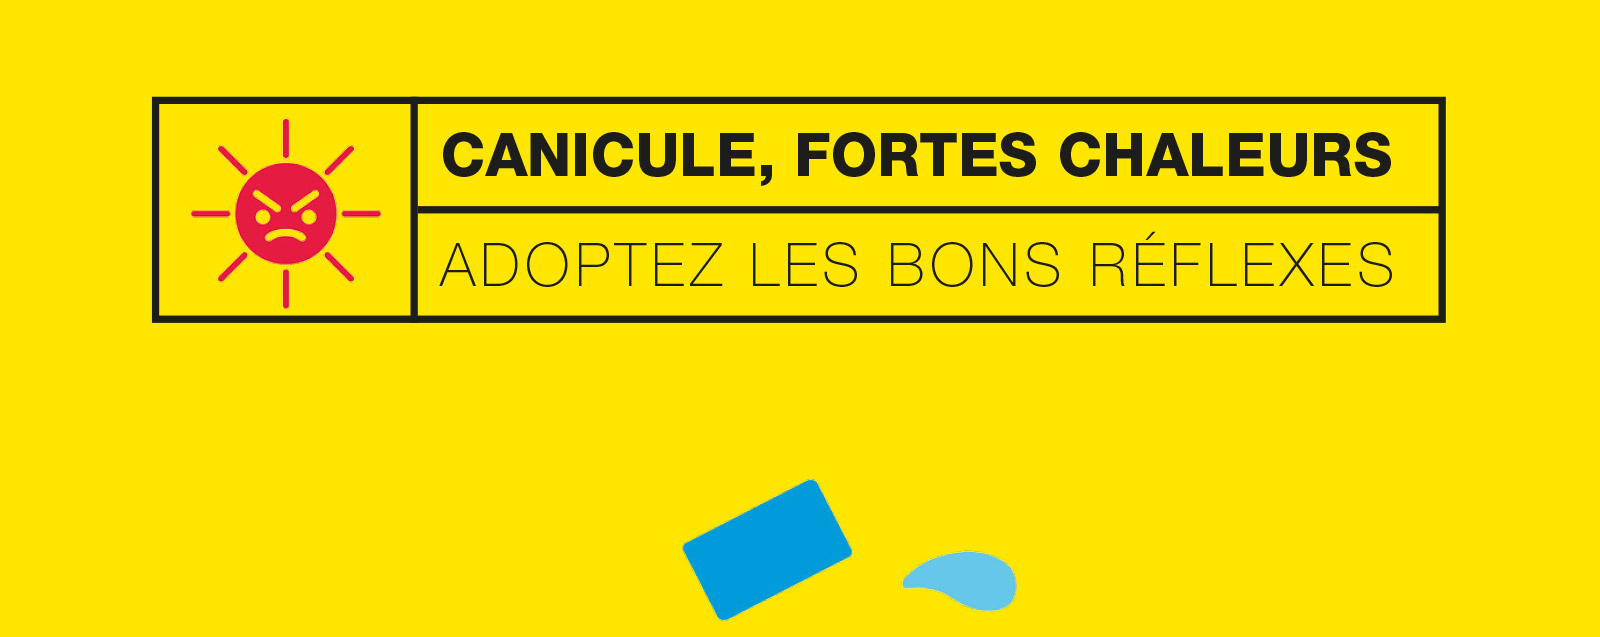 affiches_canicule